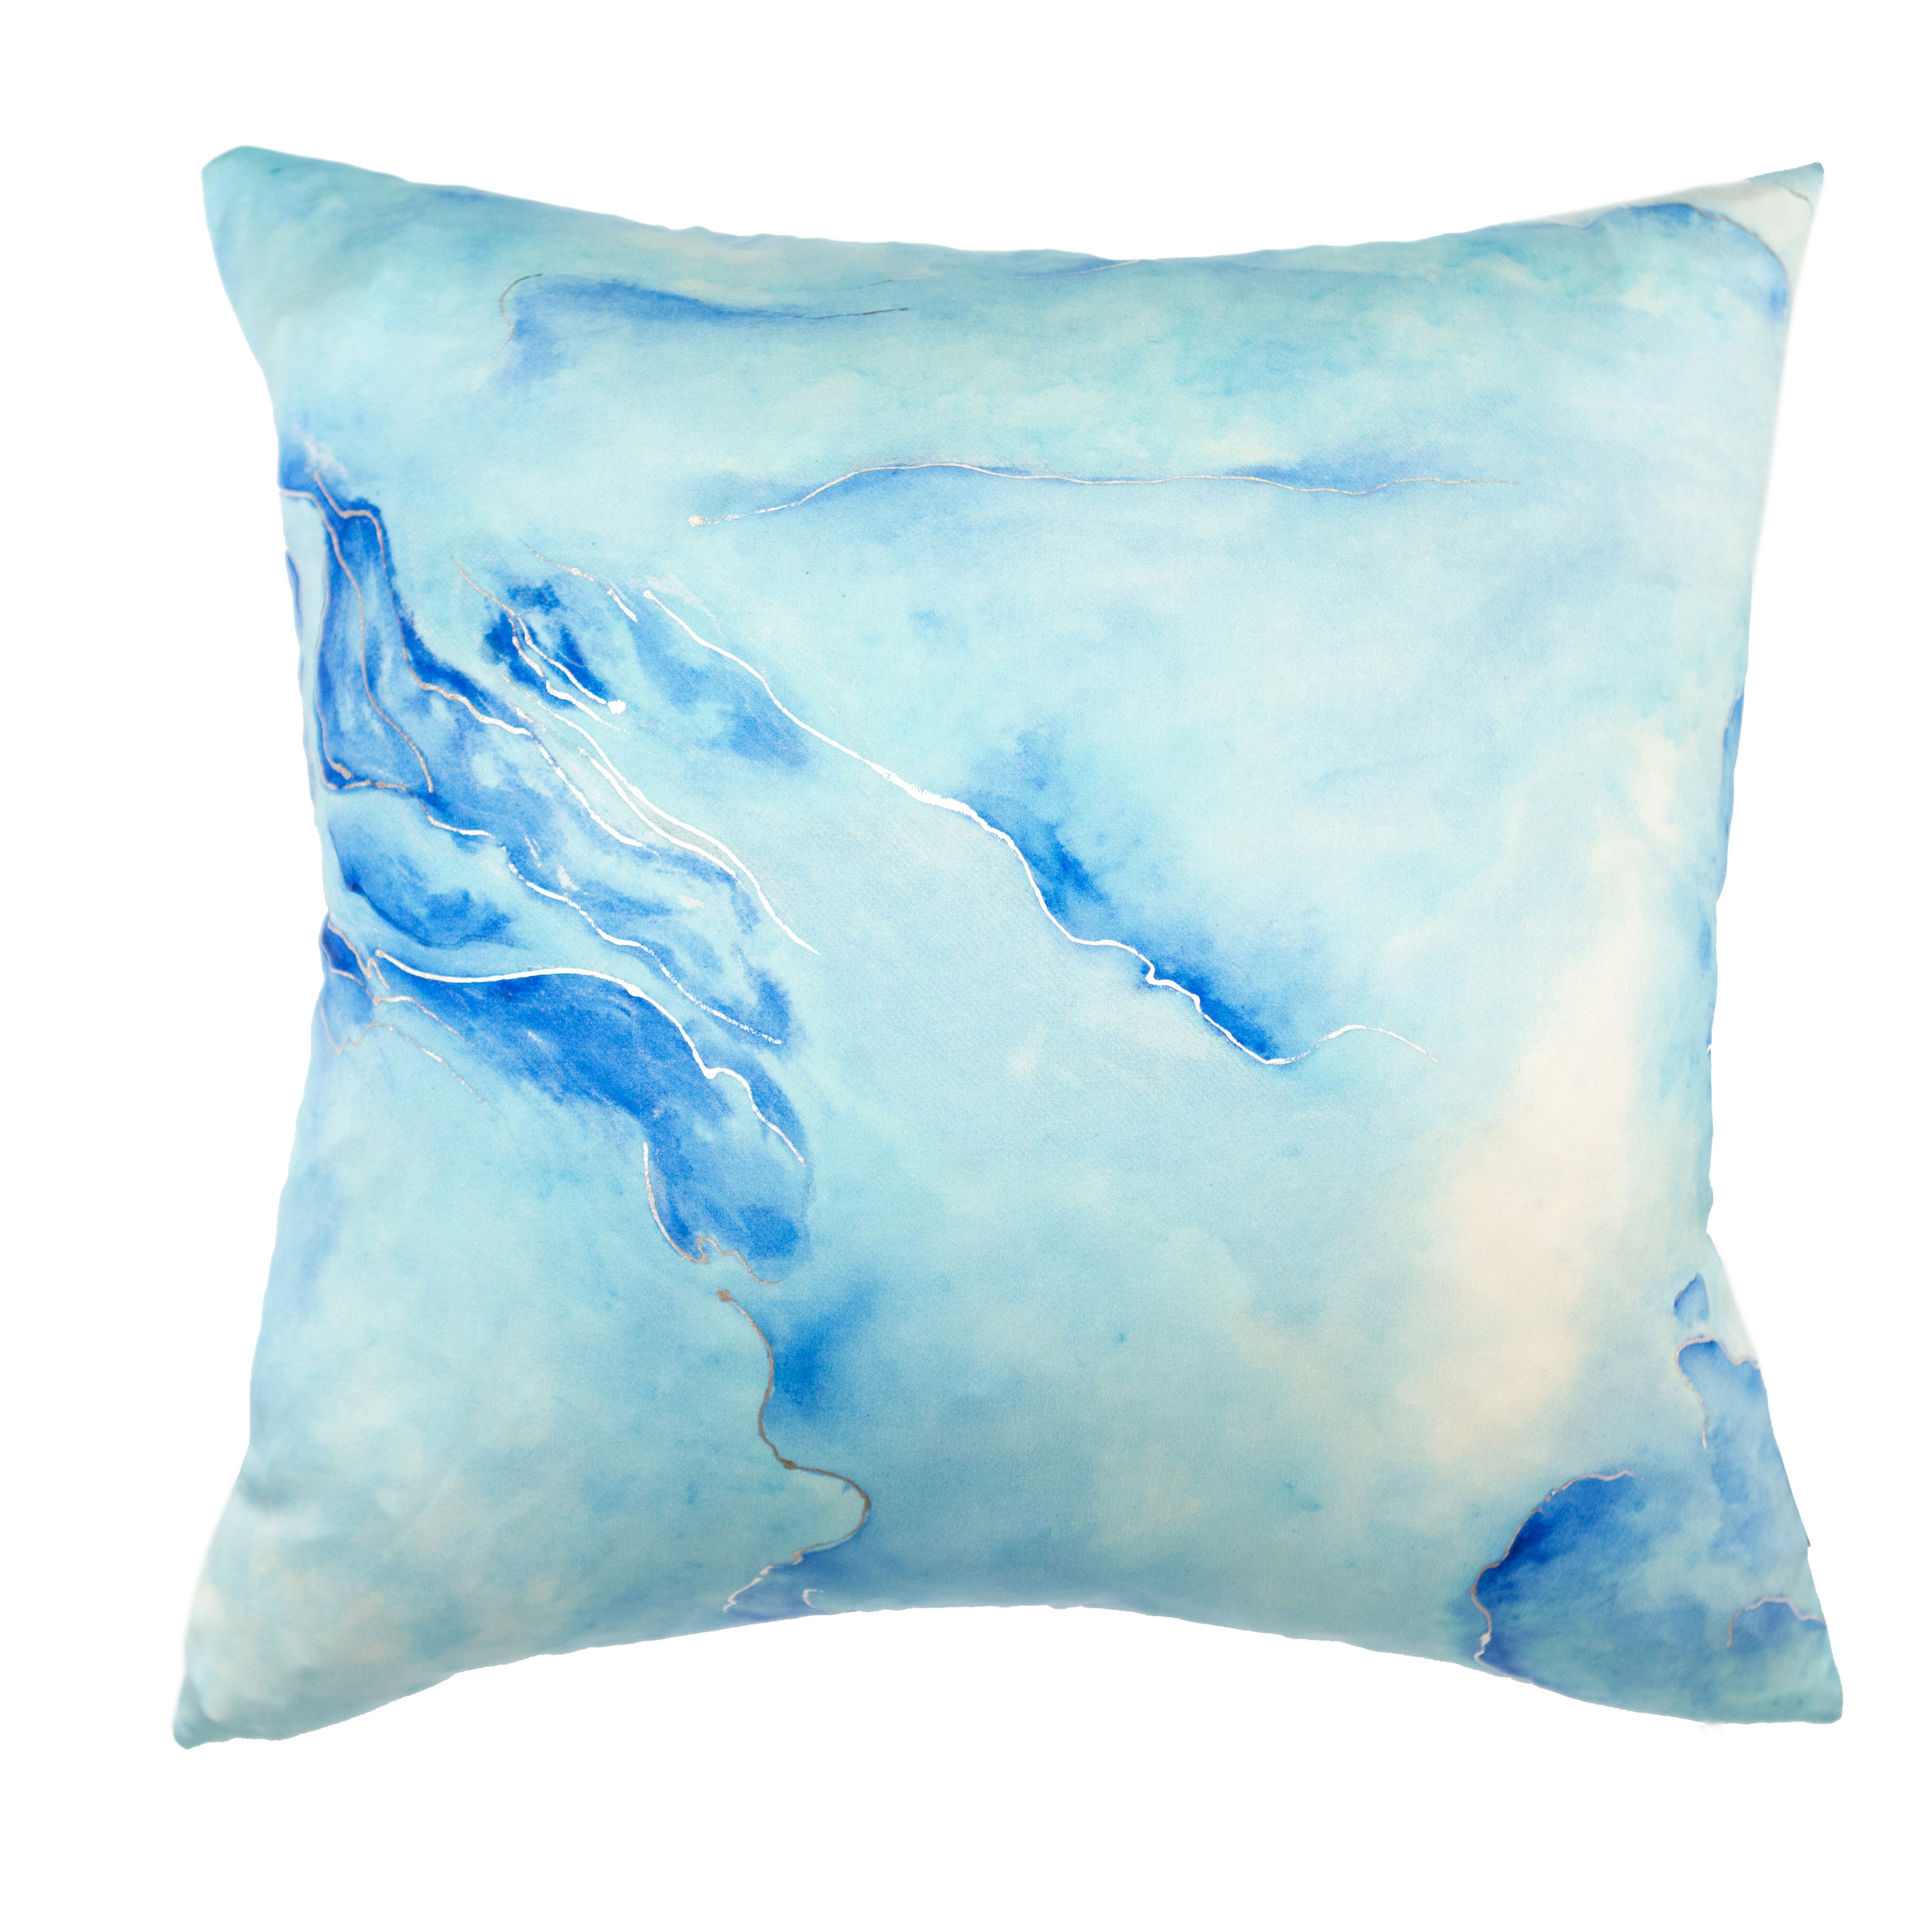 Marie-Burgos-Design.Glacier-1-Pillow.MBcollection.jpg